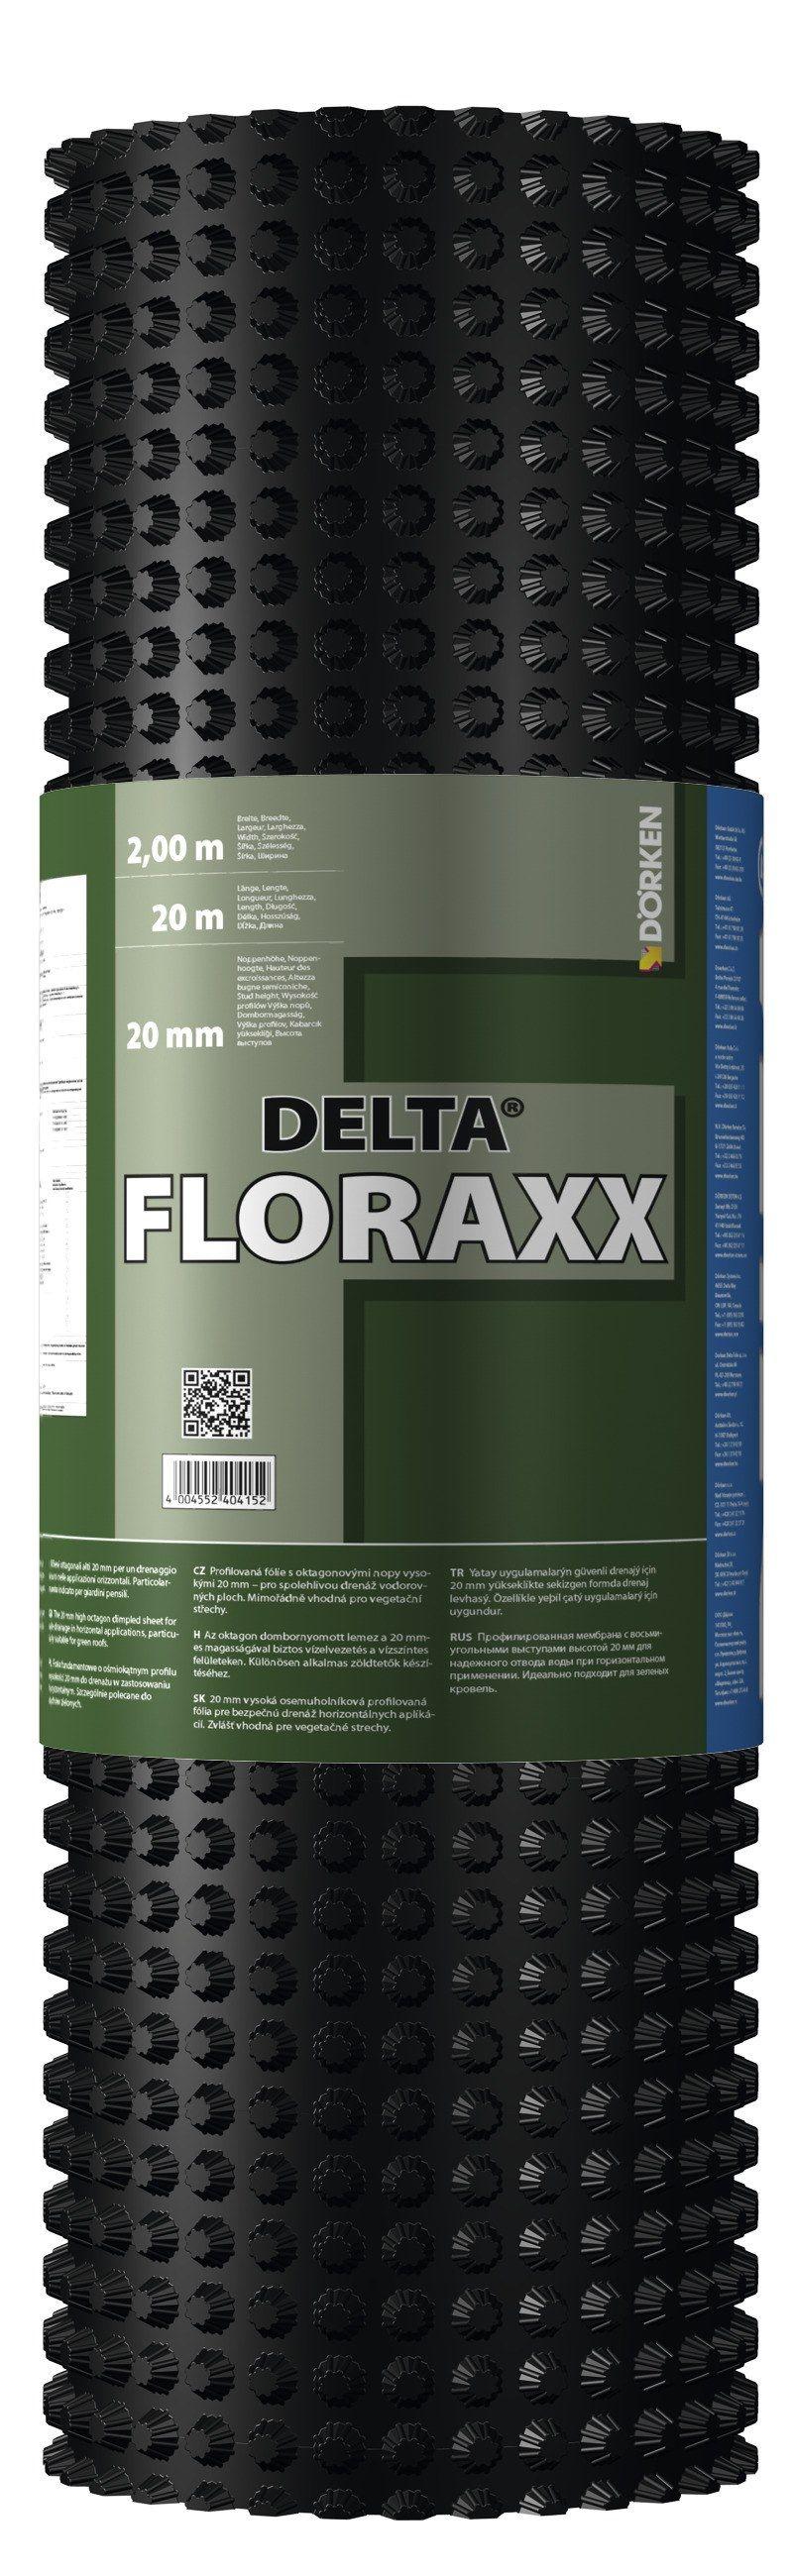 DELTA® - FLORAXX